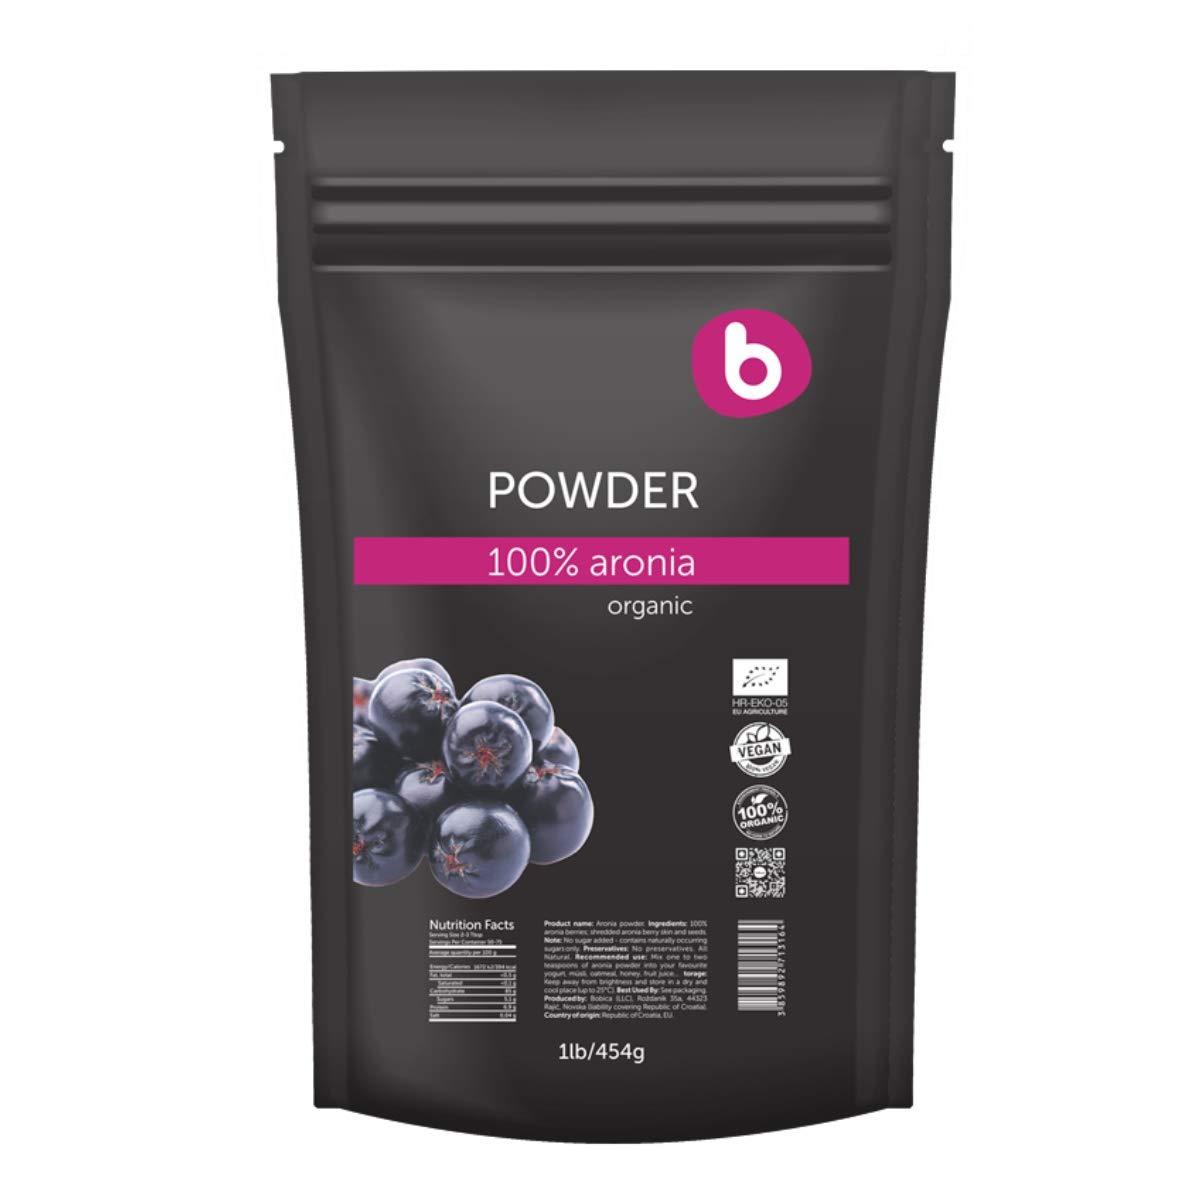 Bobica's PREMIUM European Organic Aronia Berry (Chokeberry) Powder   1lb/454g   Antioxidant Superfood, Anti-inflammatory, Immunity   100% Pure, Non-GMO, Gluten-Free, Raw   by Bobica